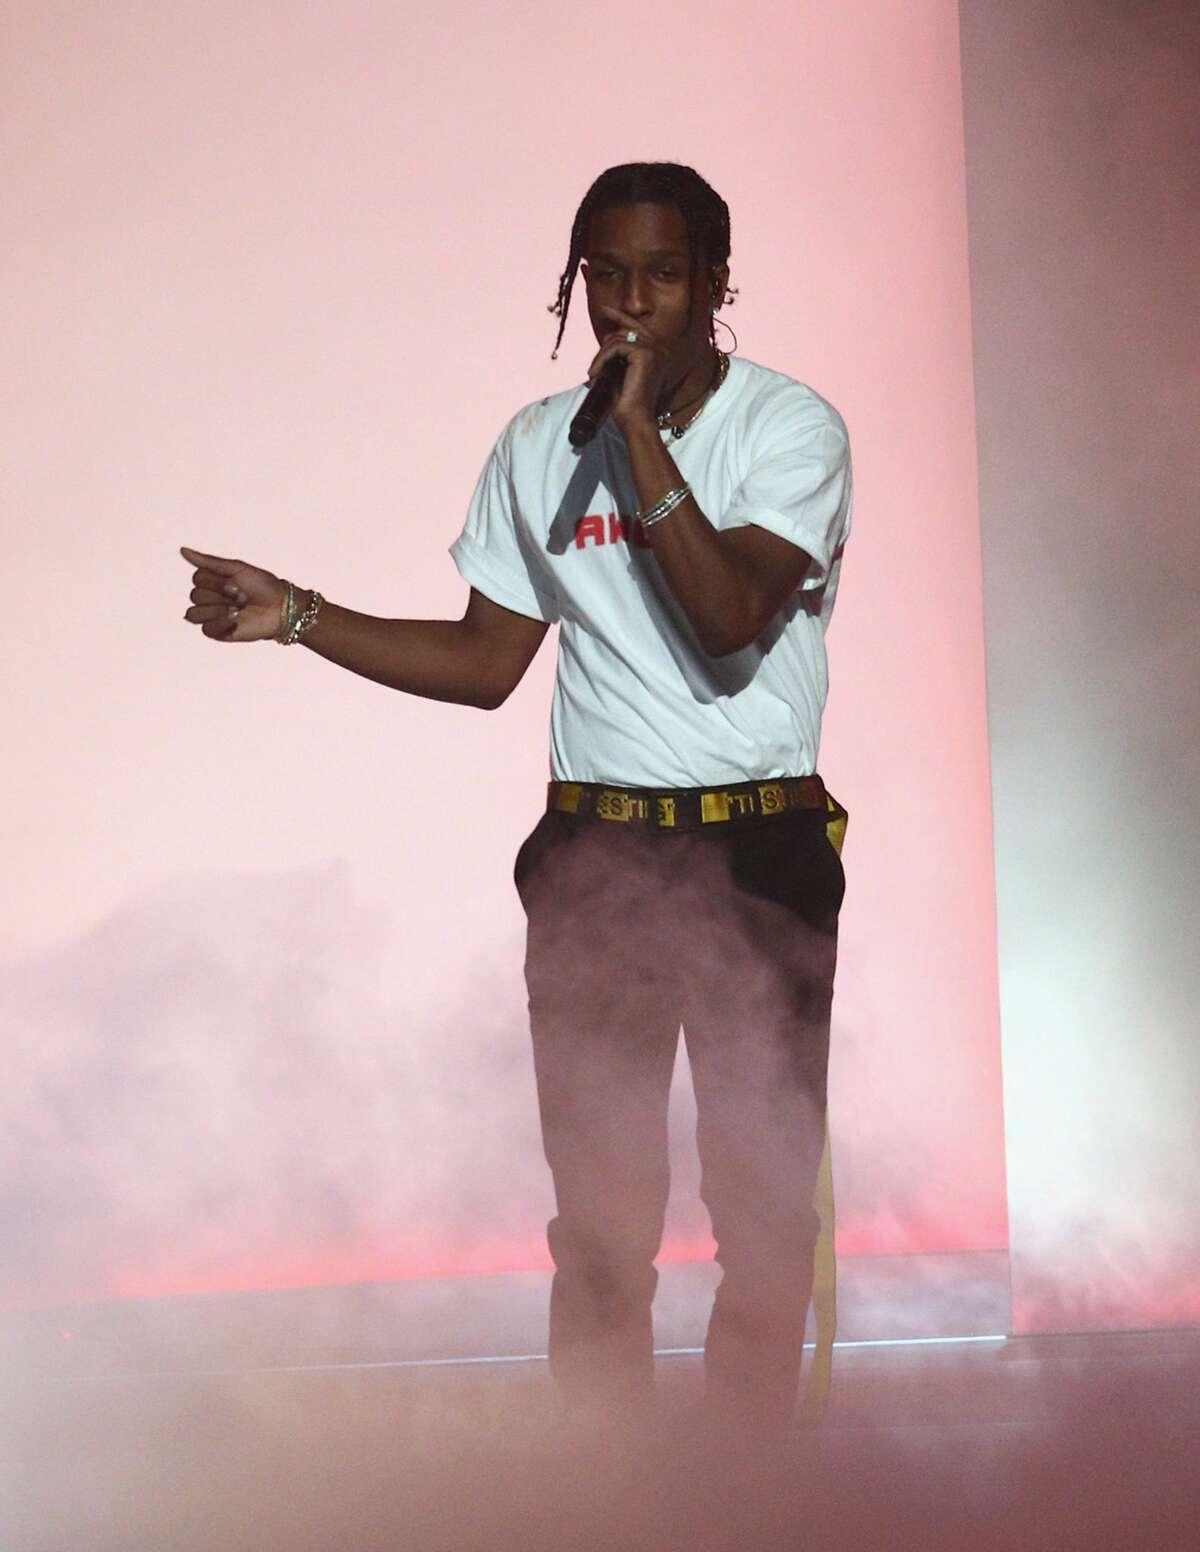 A$OP Mob: A$AP Rocky,A$AP Ferg,A$AP Twelvyy,A$AP Nast andA$AP Ant will be headlining at White Oak Music Hall on Thursday, Oct. 19. Doors open at 5:30 p.m. More Details:www.whiteoakmusichall.com